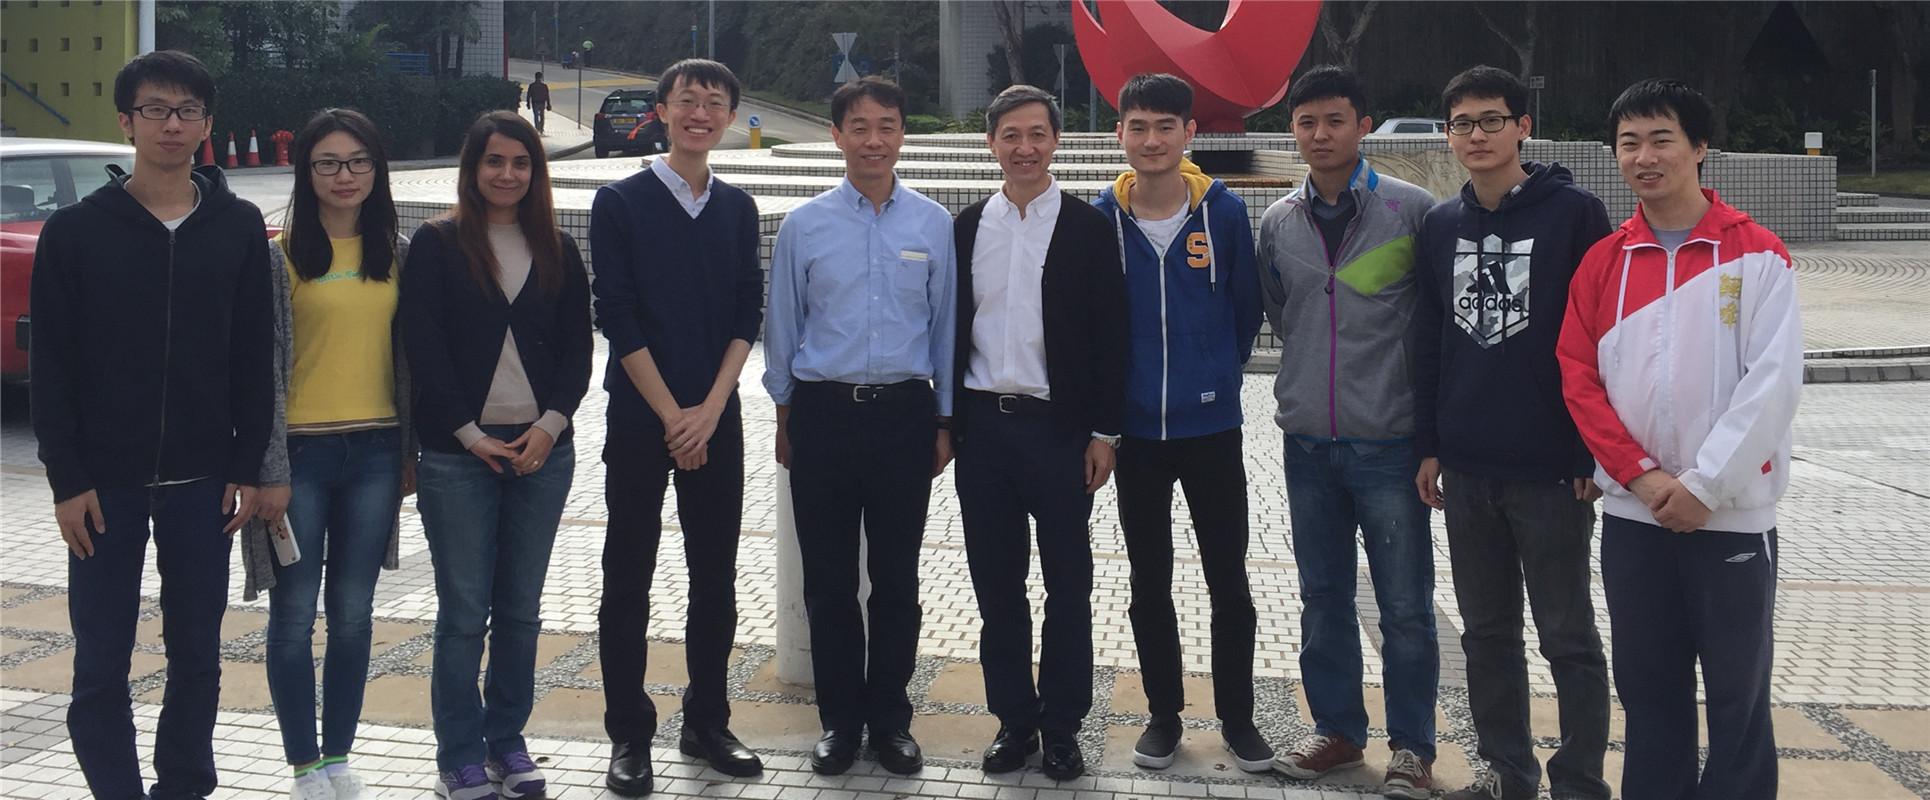 Prof. Nei Kato from Tohoku University visited our group